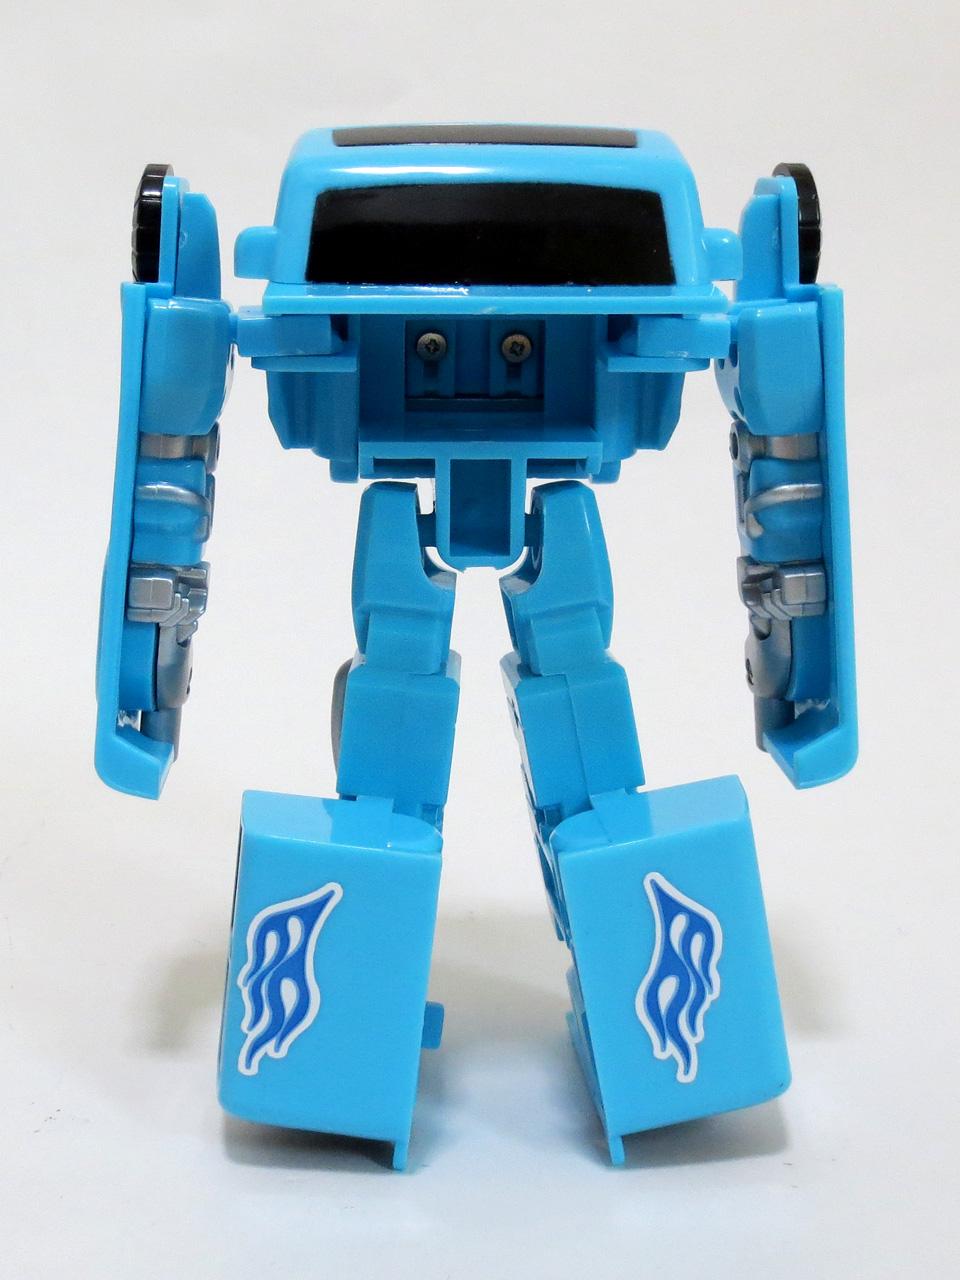 Robo_max_4wd_type_16.jpg